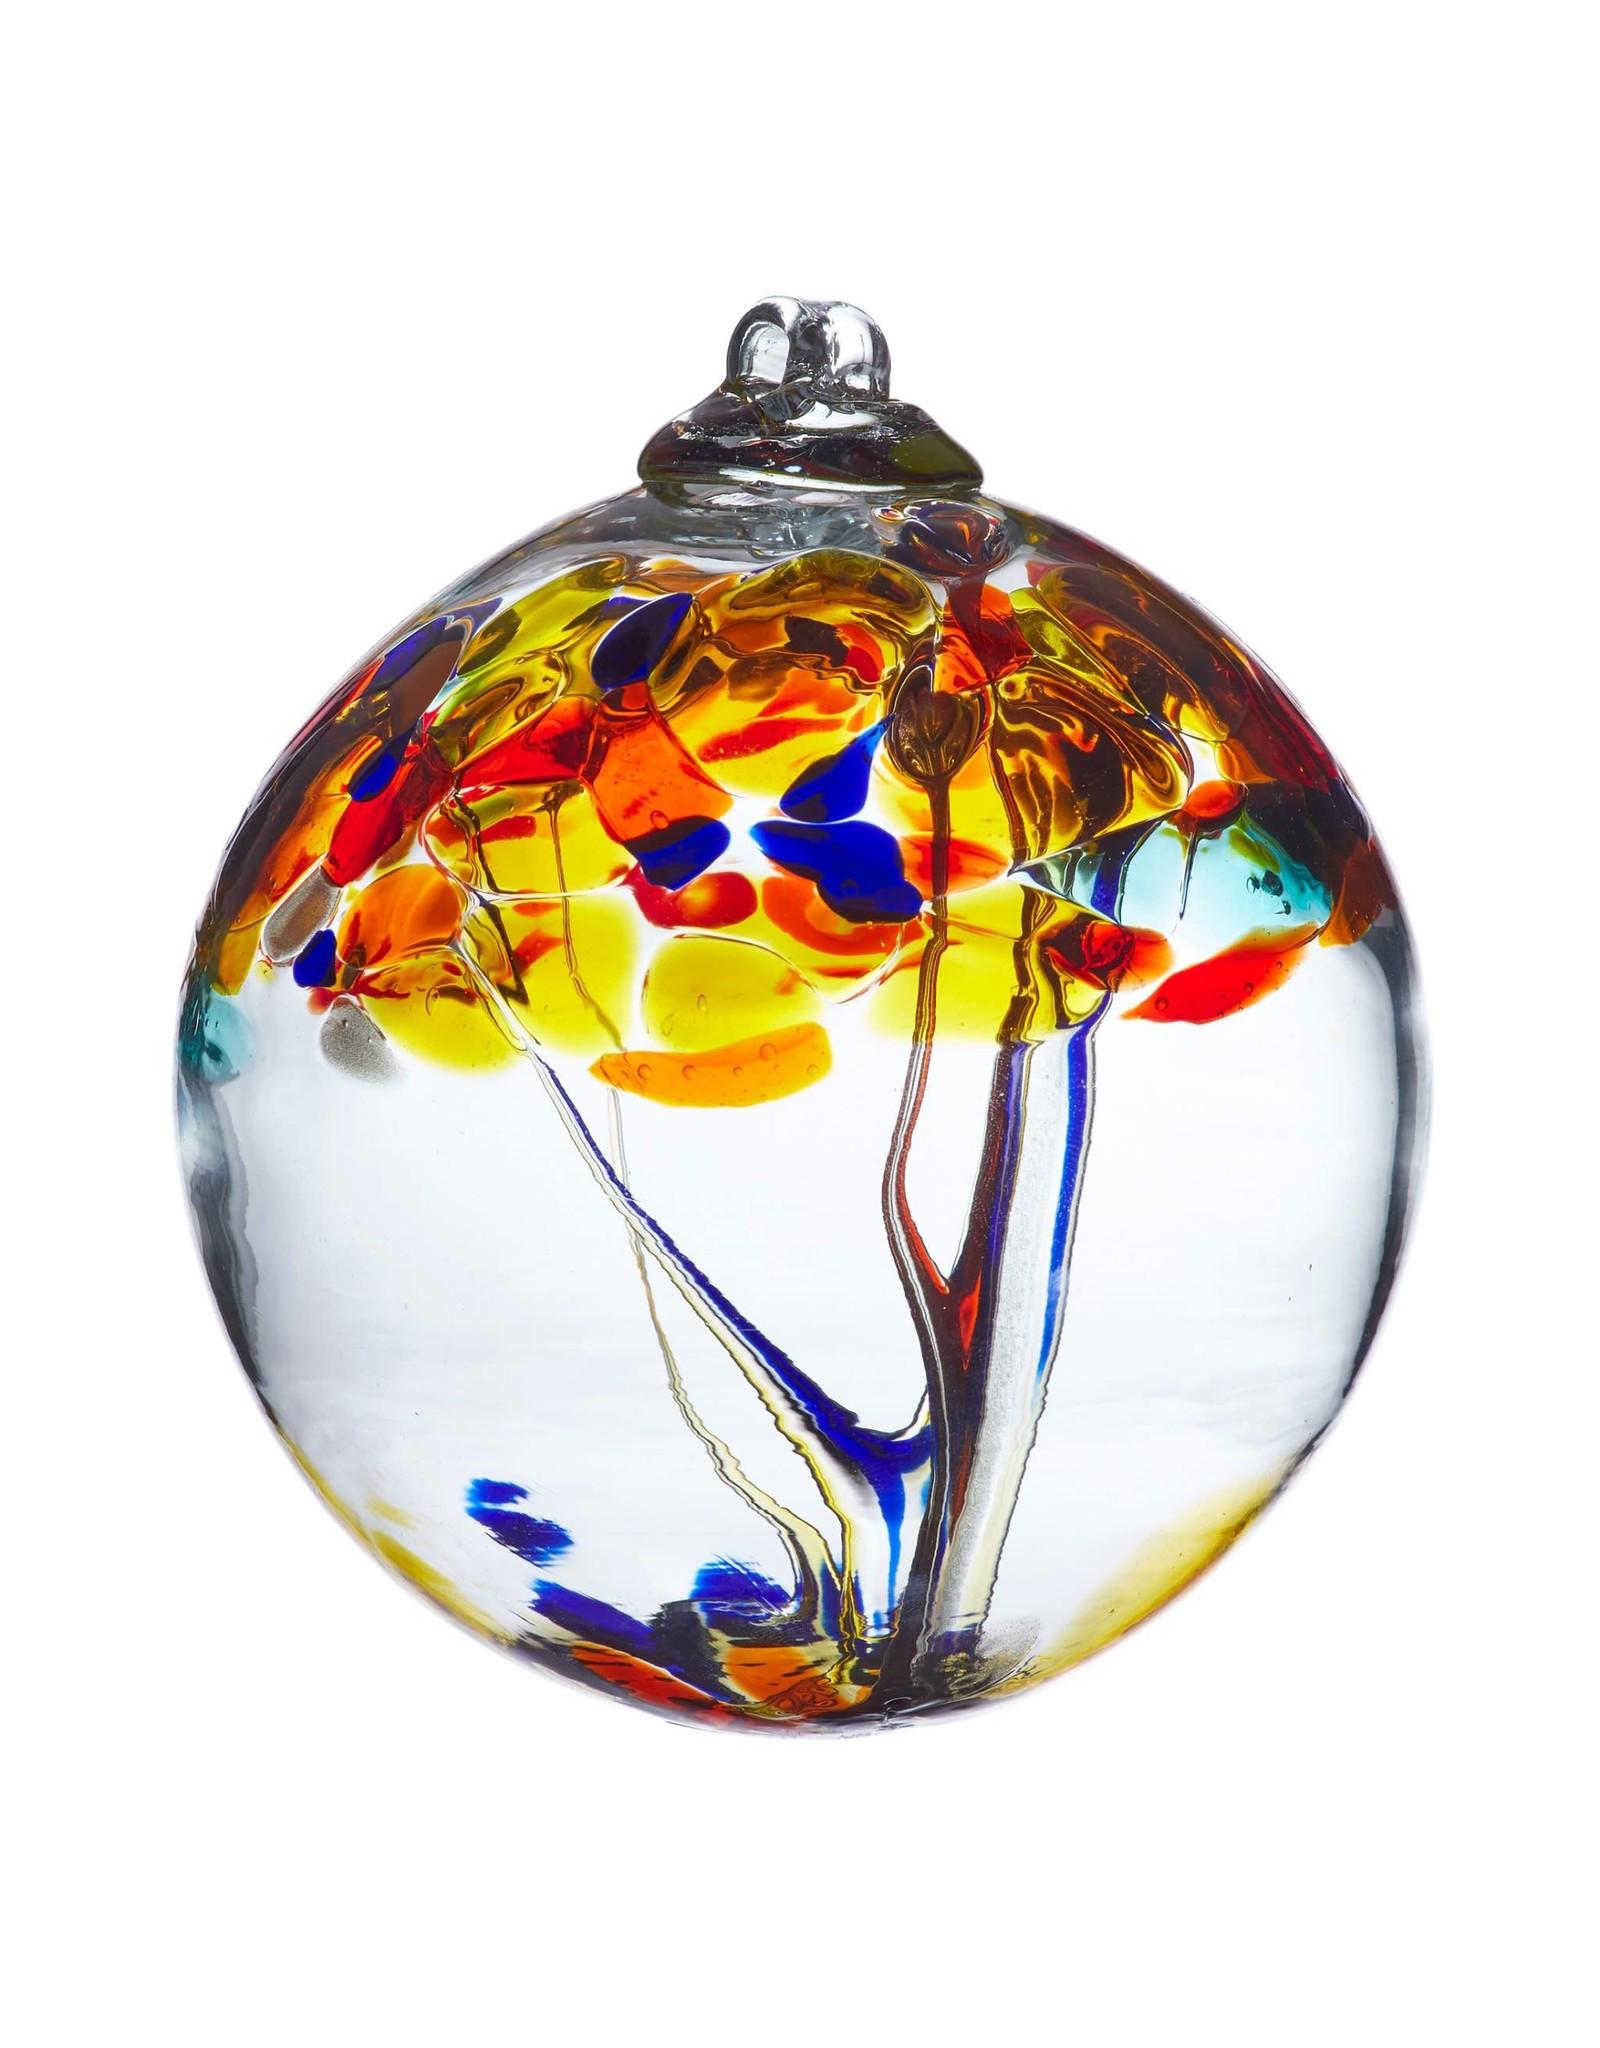 "Kitras Art Glass POSITIVITY (Trees of Enchantment, 6"" D., KITRAS)"